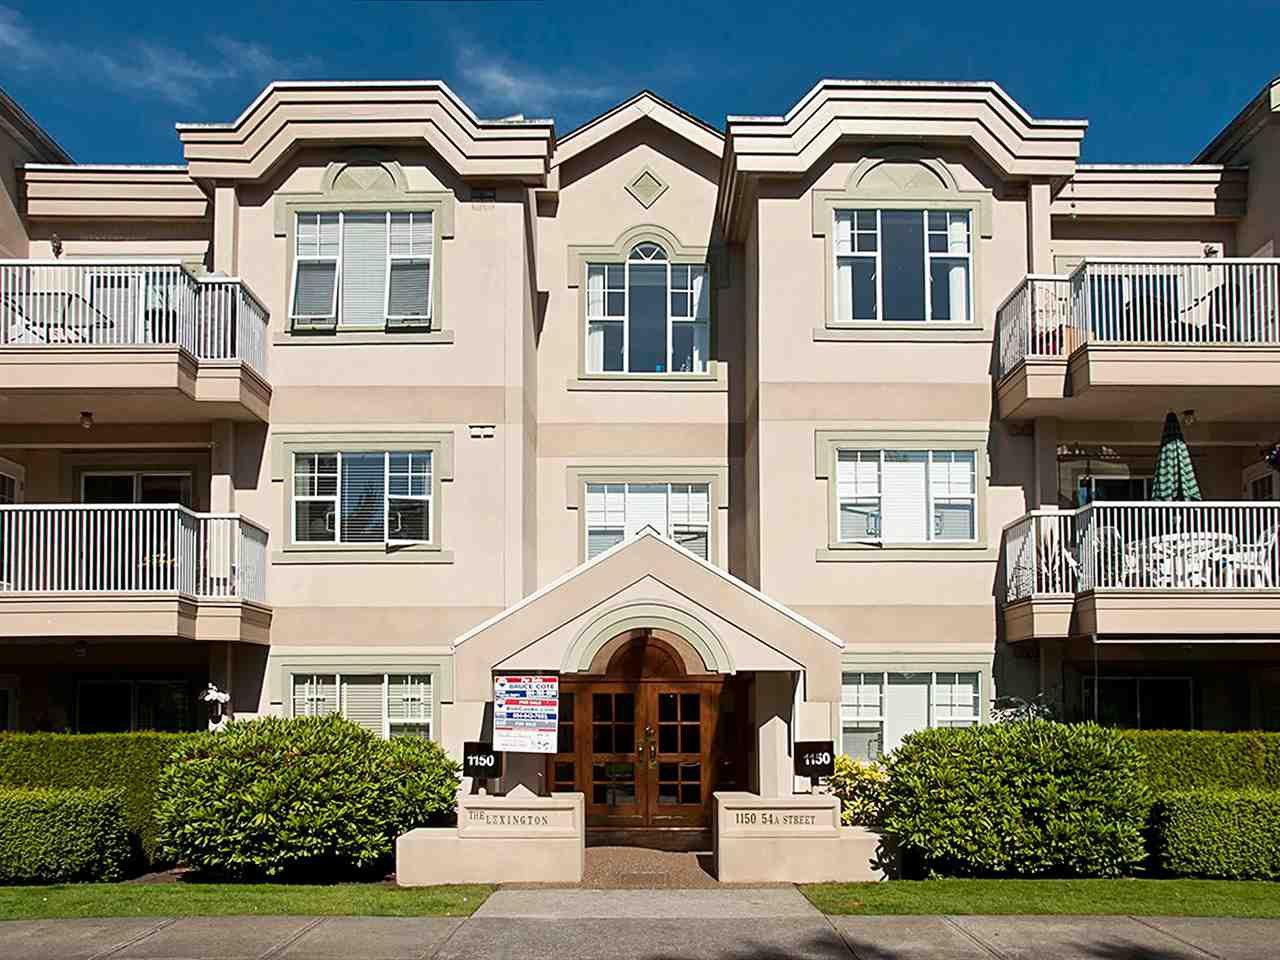 Main Photo: 211 1150 54A Street in Delta: Tsawwassen Central Condo for sale (Tsawwassen)  : MLS®# R2150735